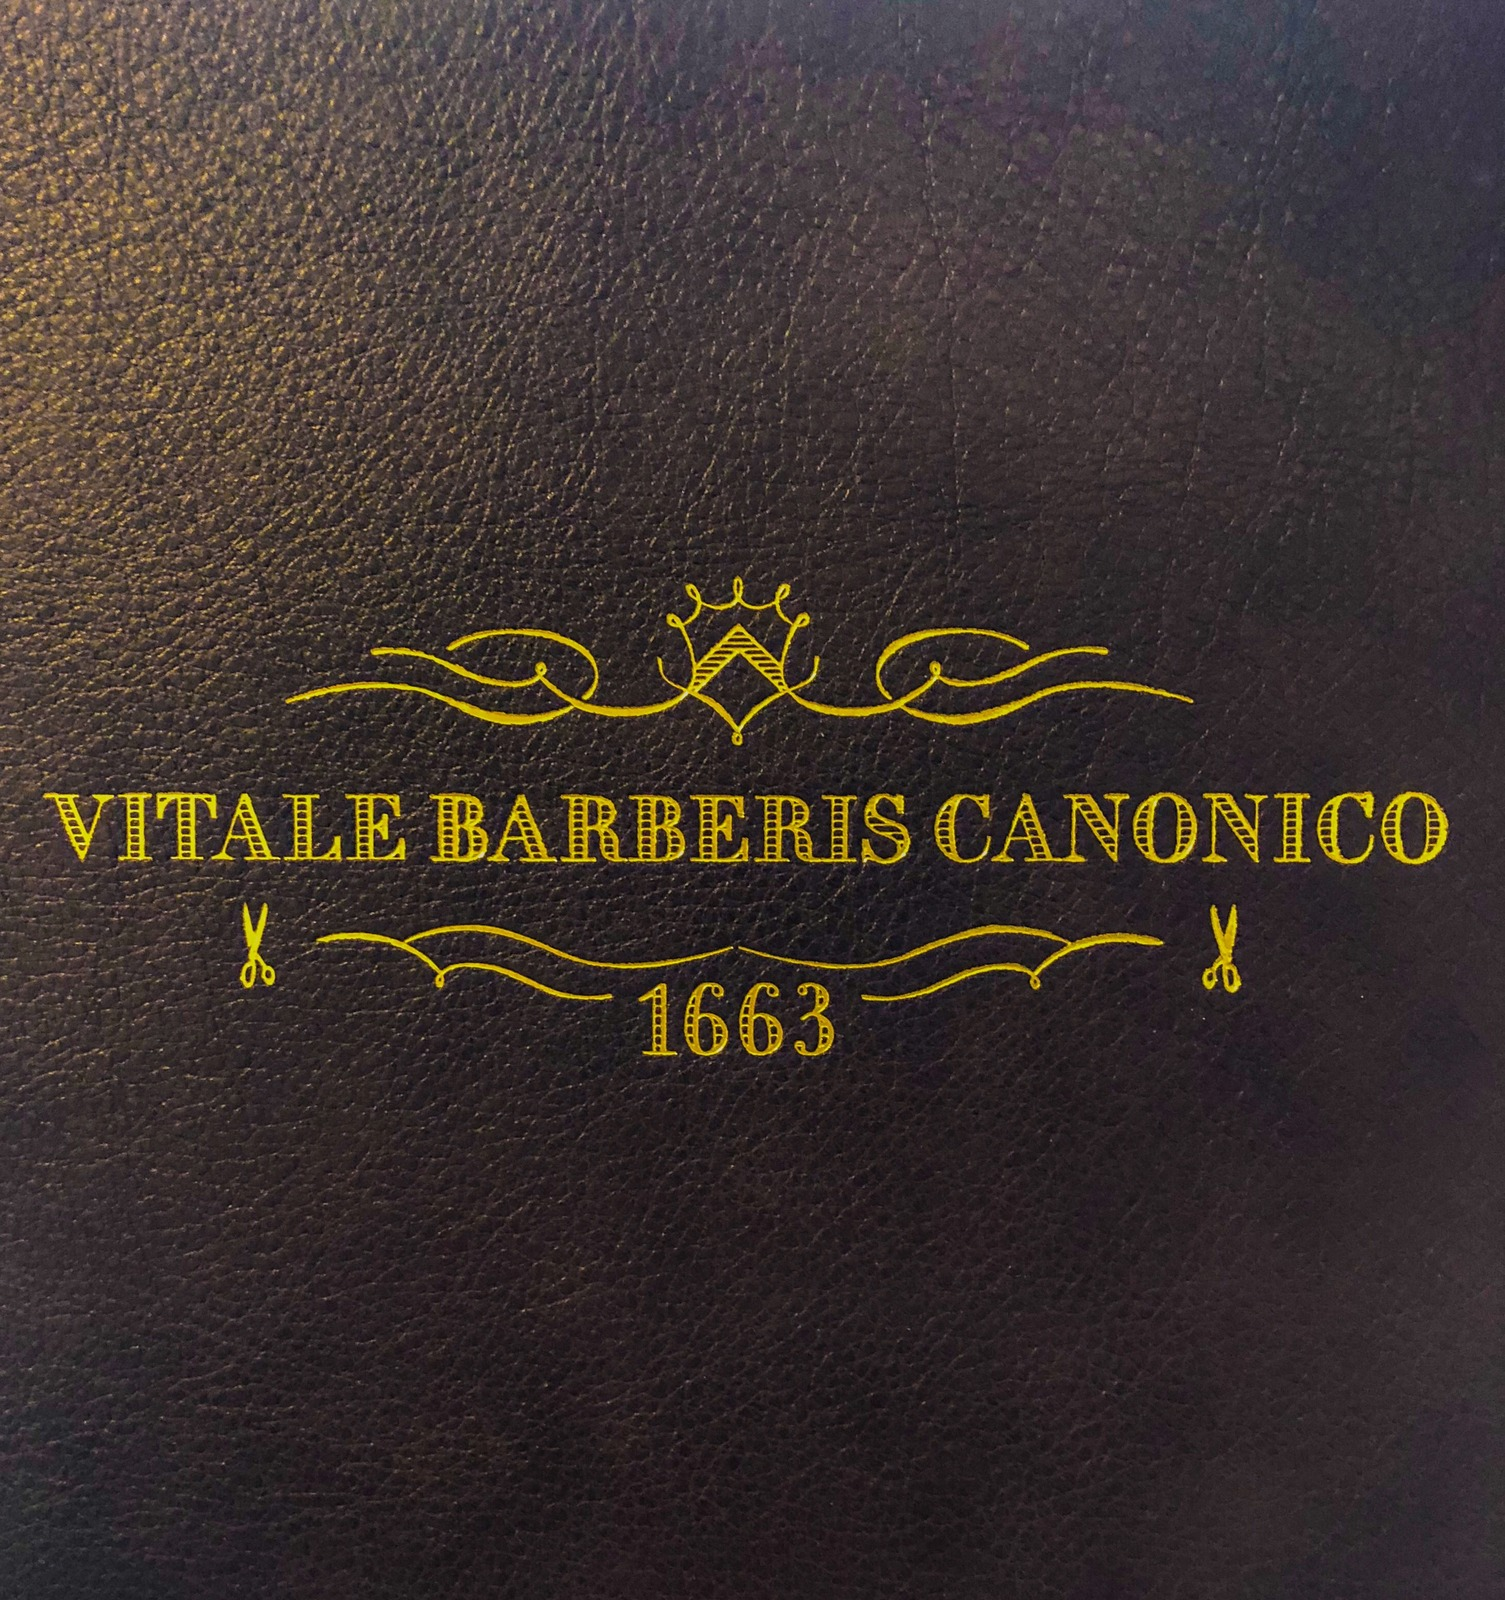 Italian Fabric Mill Vitale Barberis Canonico